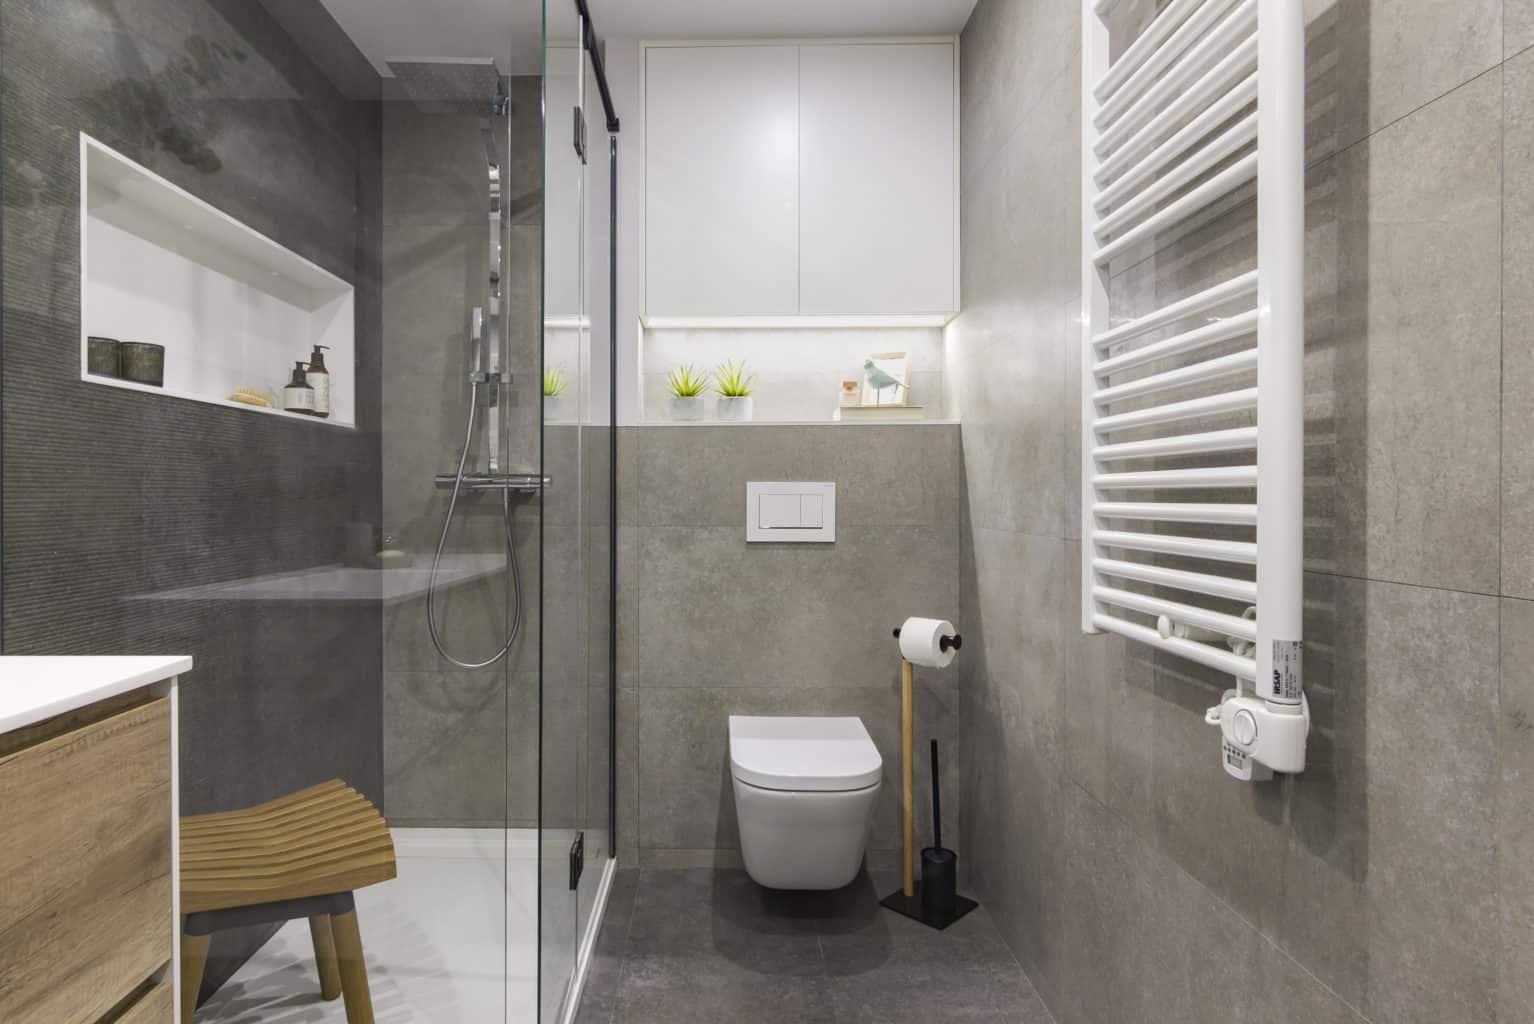 reformes de banys a barcelona, encainteriors